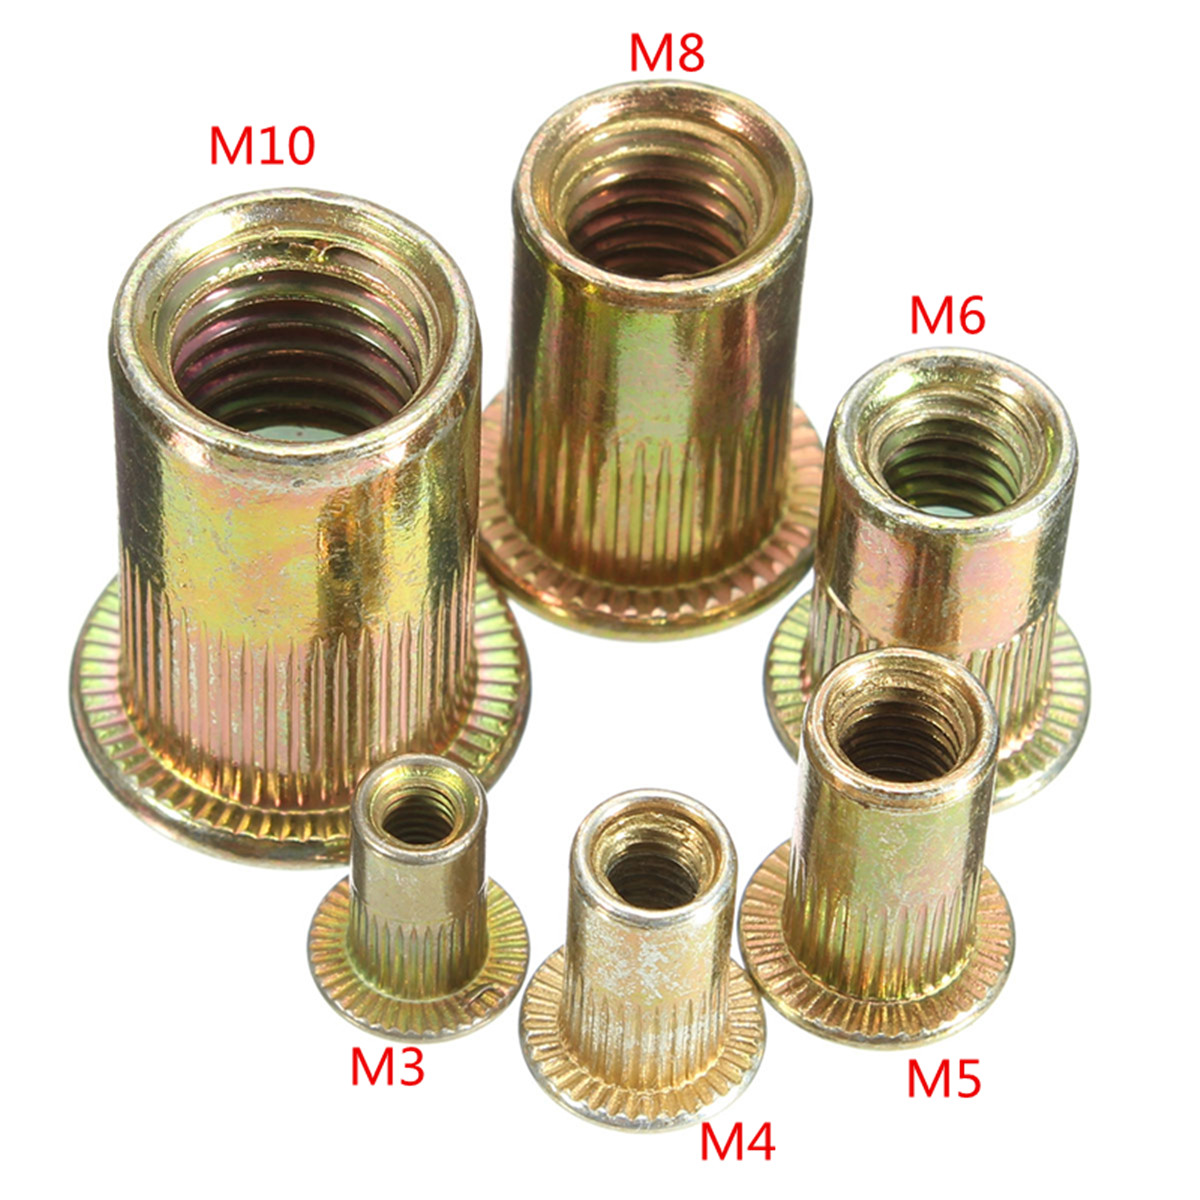 10PCS Multi Size Carbon Steel Rivet Nuts Flat Head Rivet Nuts Set Nuts Insert Riveting M3 M4 M6 M8 M10